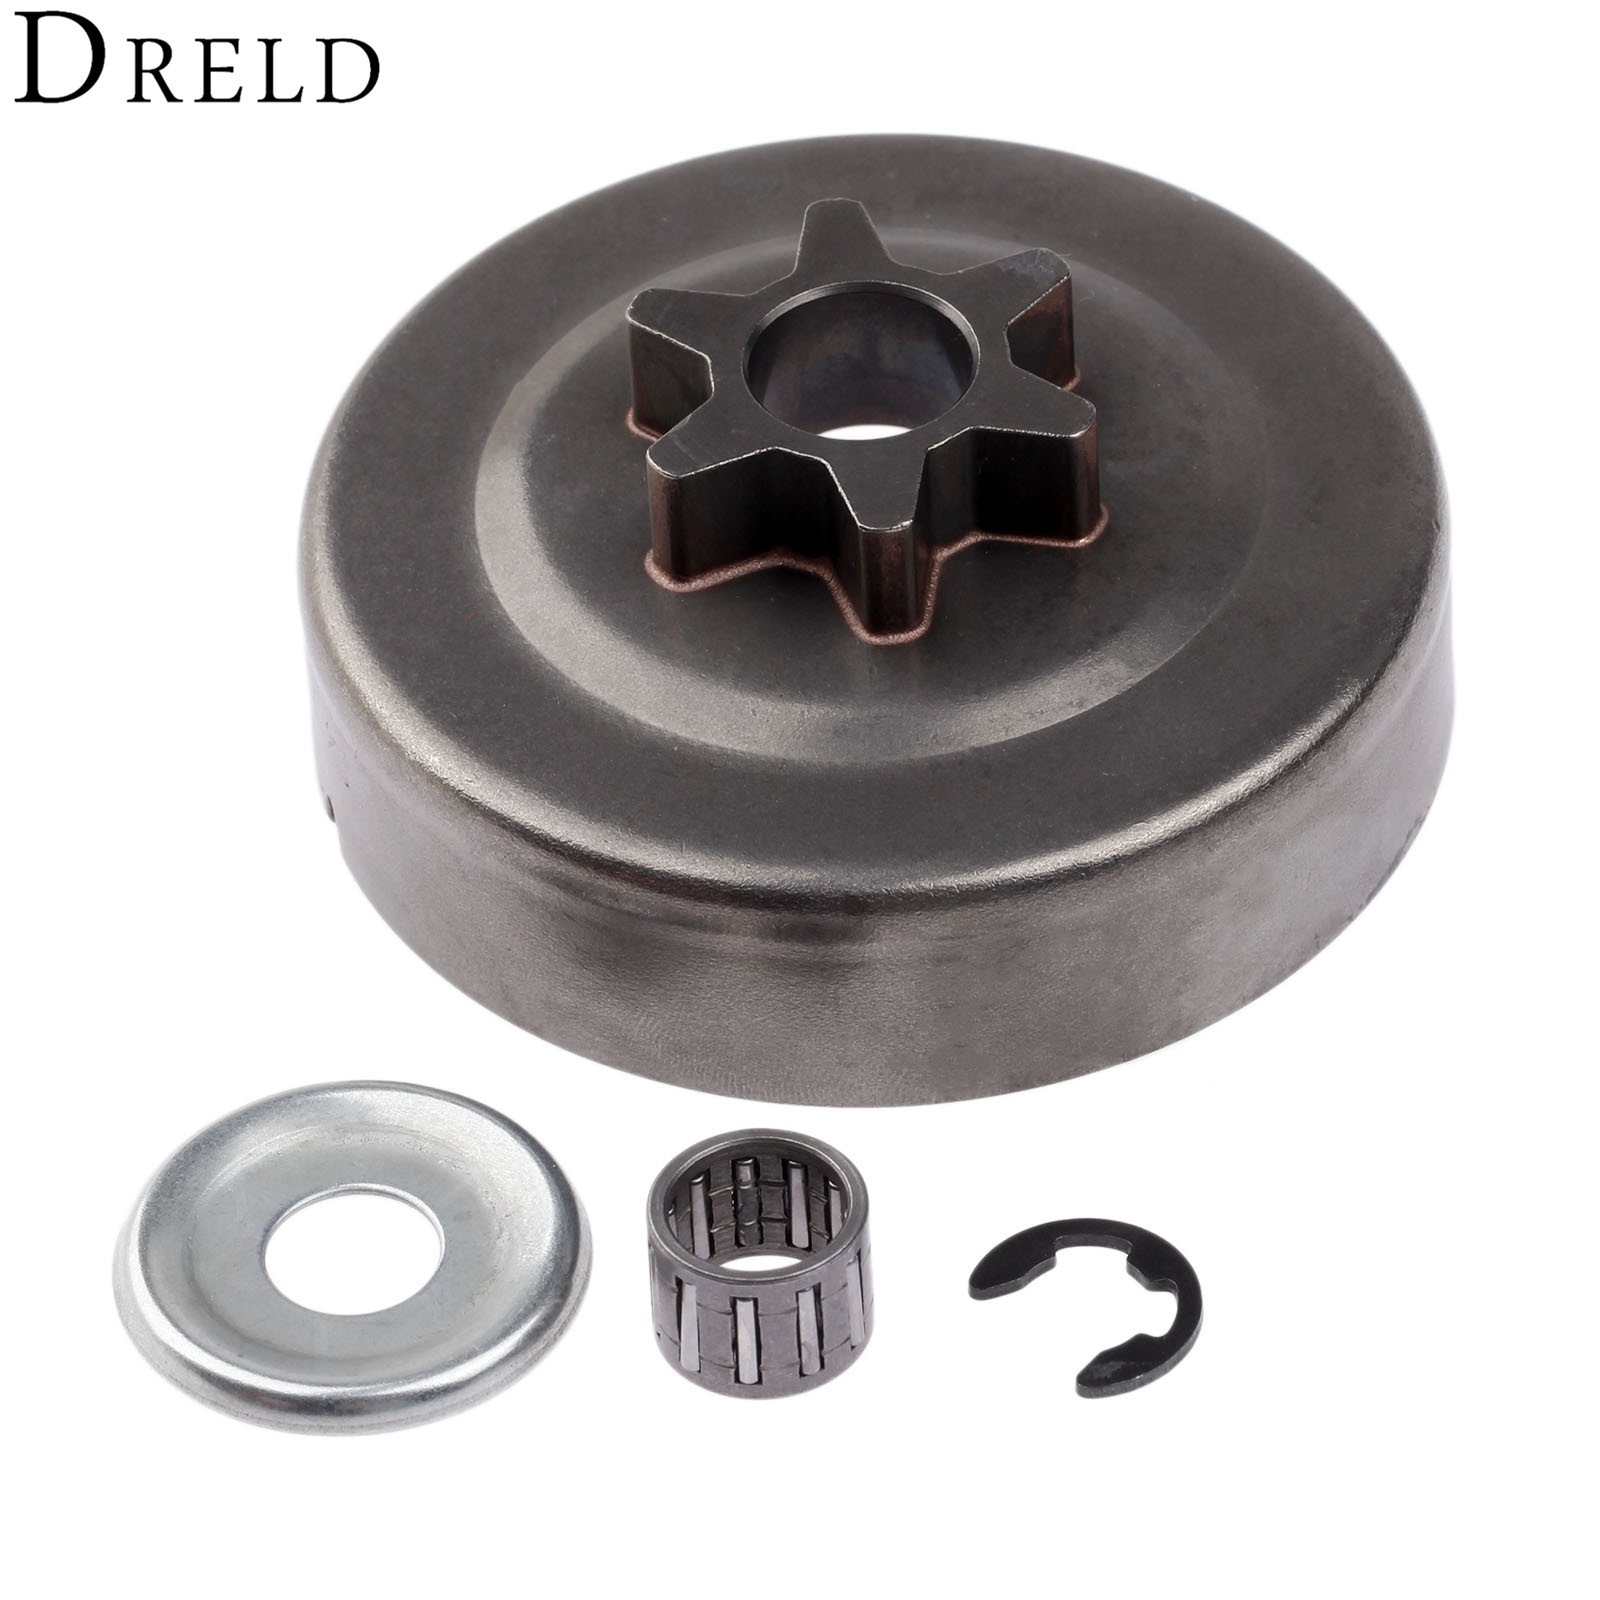 DRELD 3/8 6 t Embreagem Cilindro de Roda Dentada Arruela E Clip-Kit Para Motosserra STIHL 017 018 021 023 025 MS170 MS180 MS210 MS230 MS250 1123